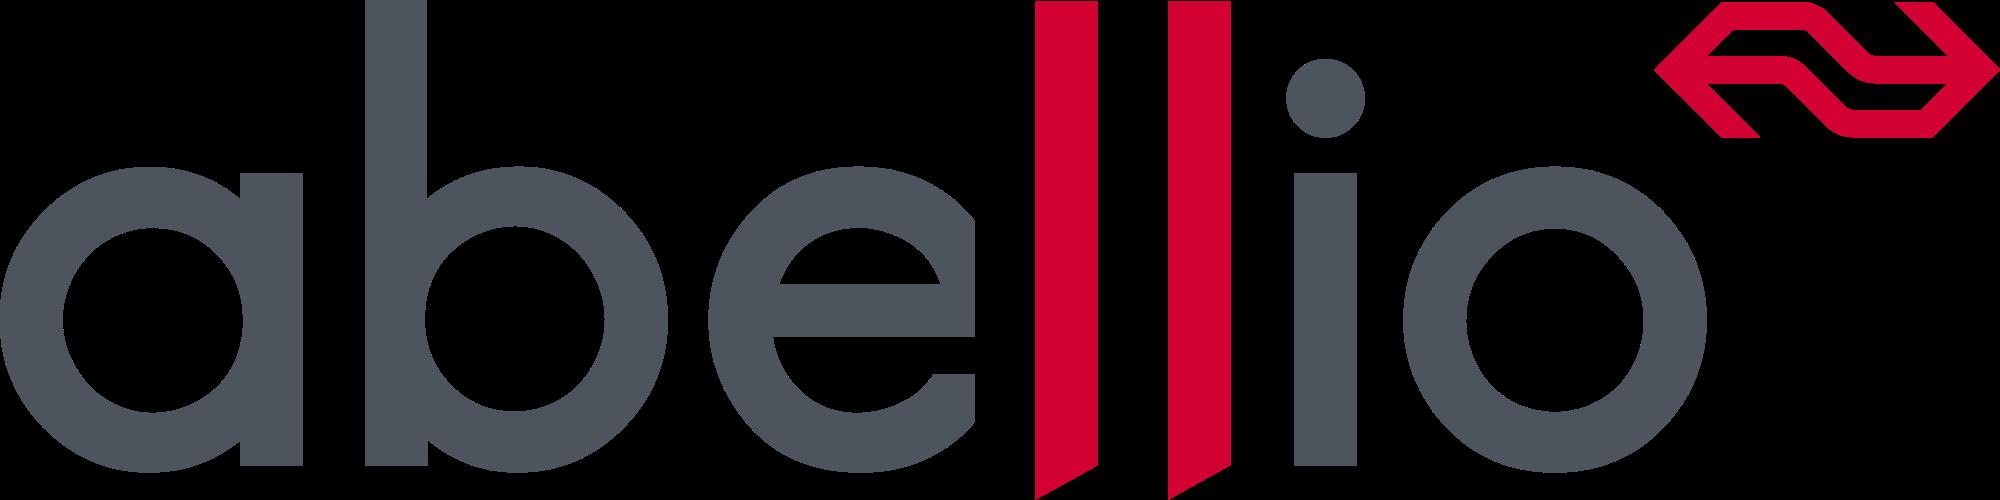 Abellio_logo.png